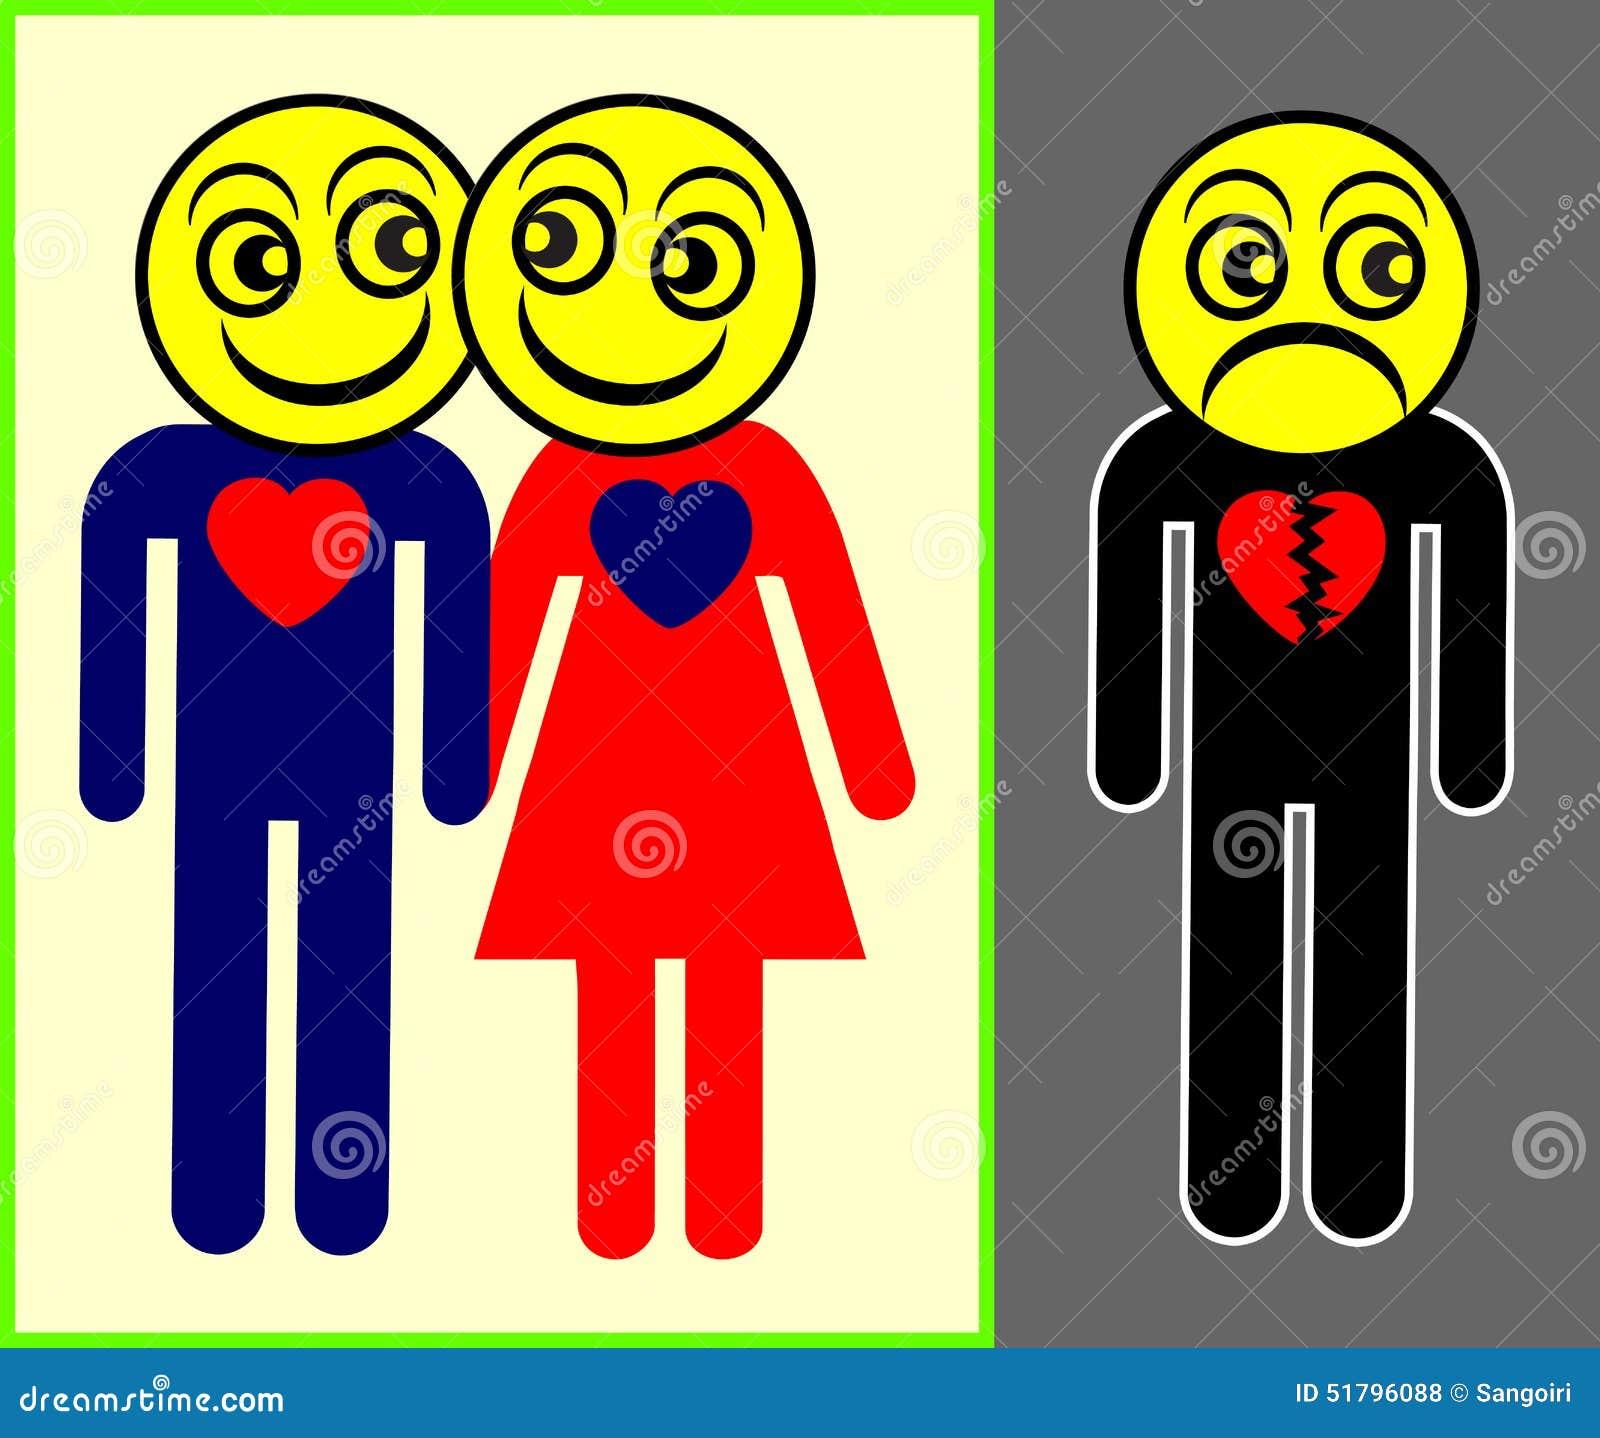 Jealousy stock illustration  Illustration of disorder - 51796088